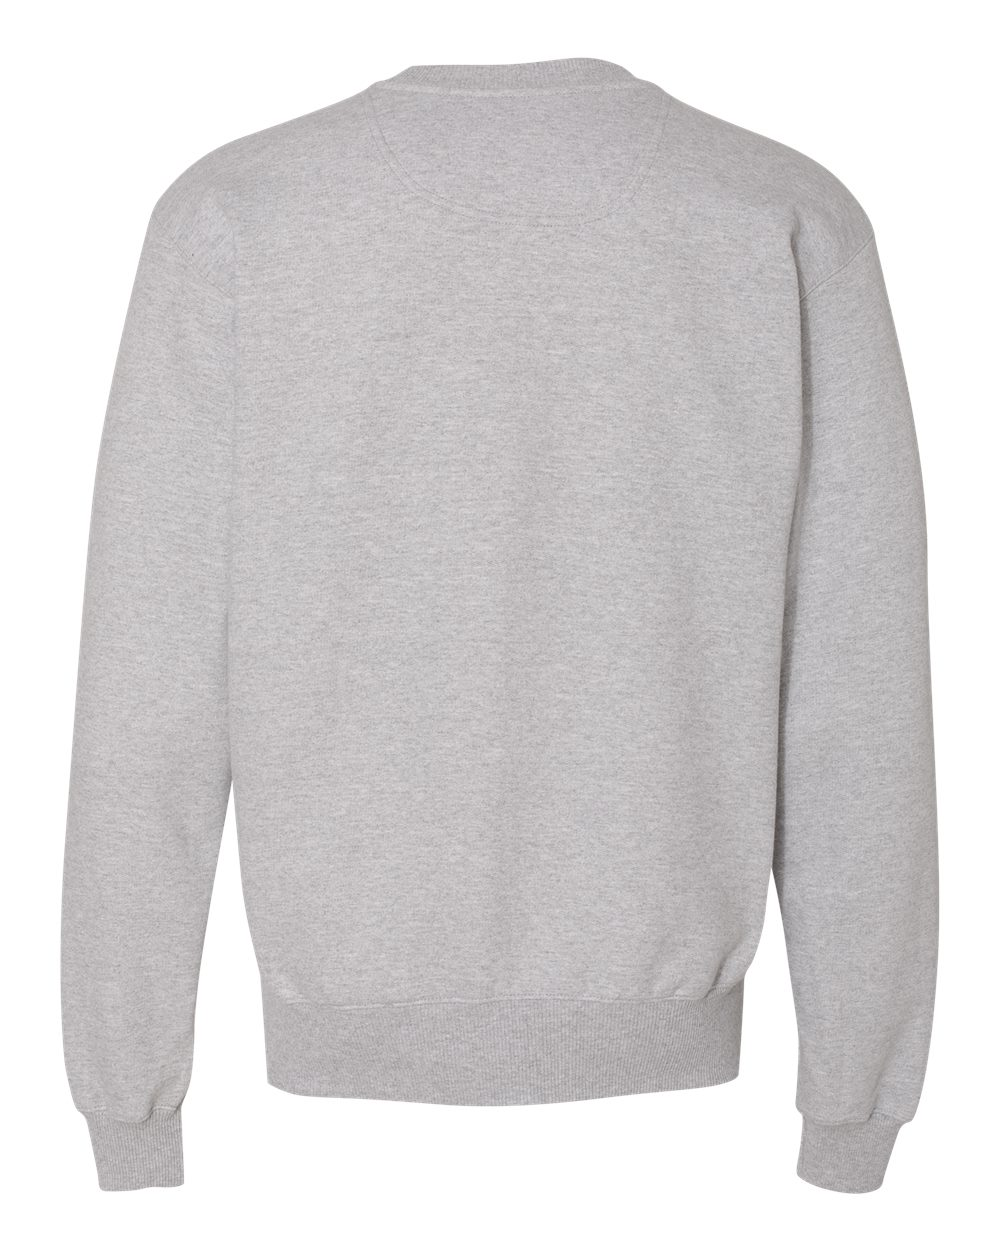 Champion-Mens-Cotton-Max-Crewneck-Sweatshirt-Pullover-S178-up-to-3XL miniature 10